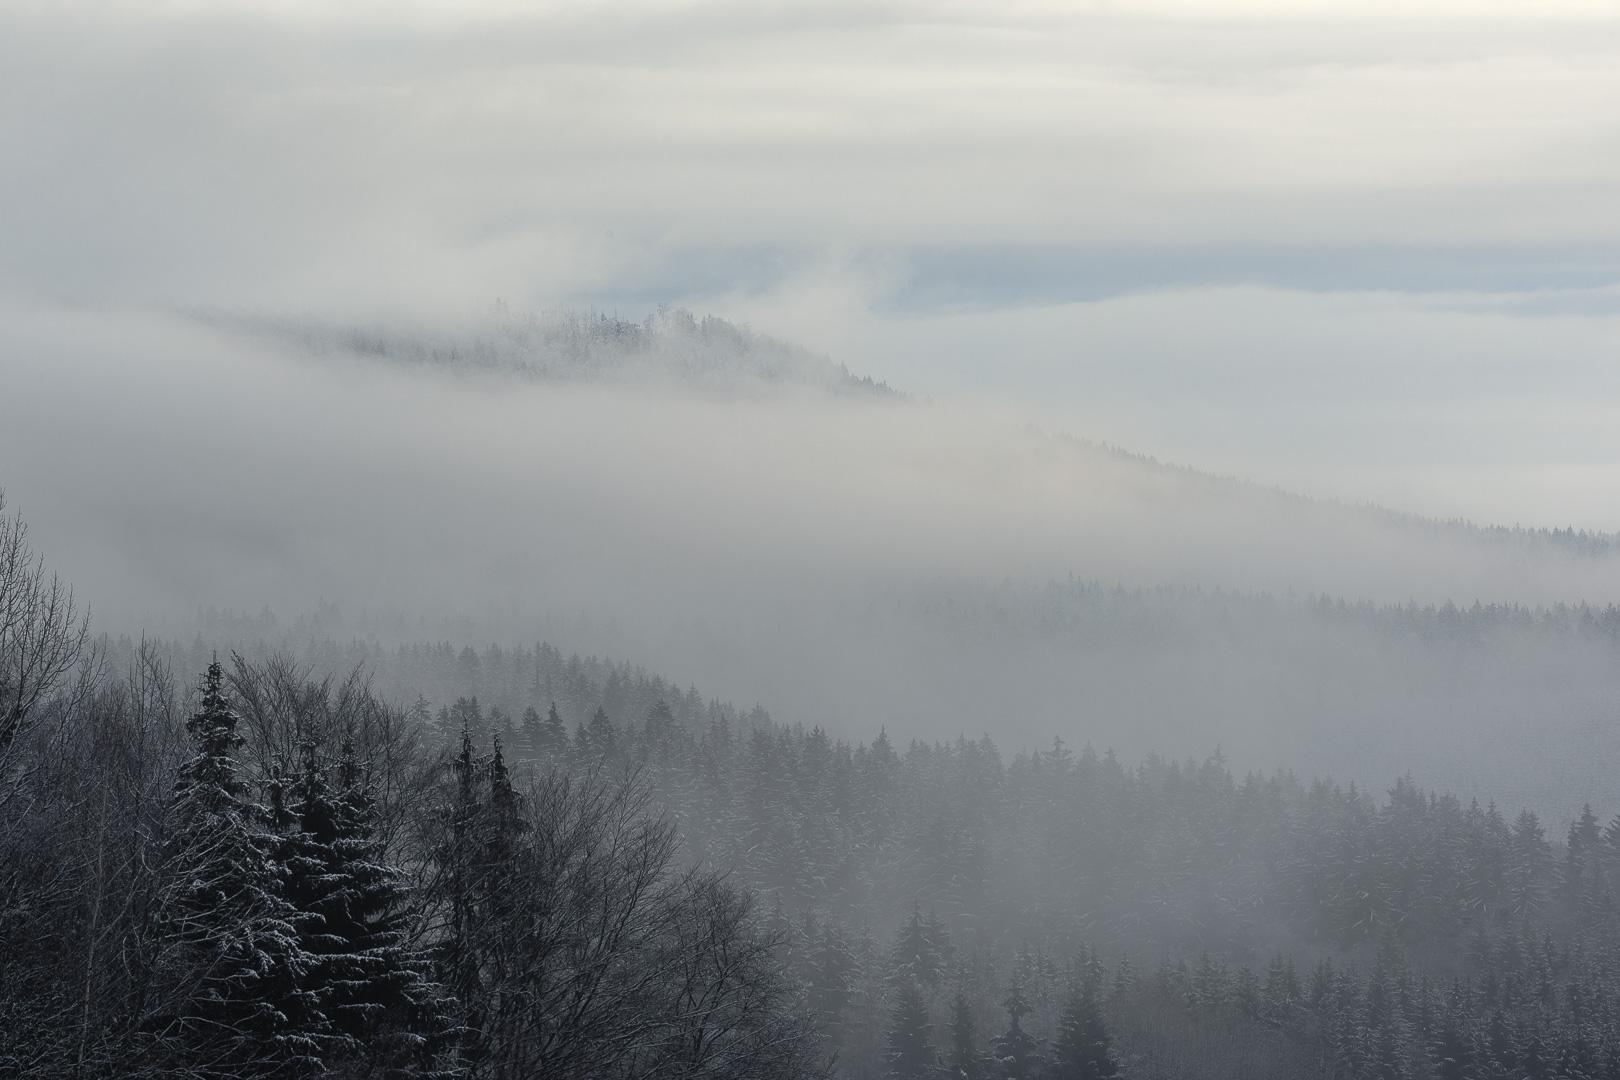 Góry stołowe_winieta